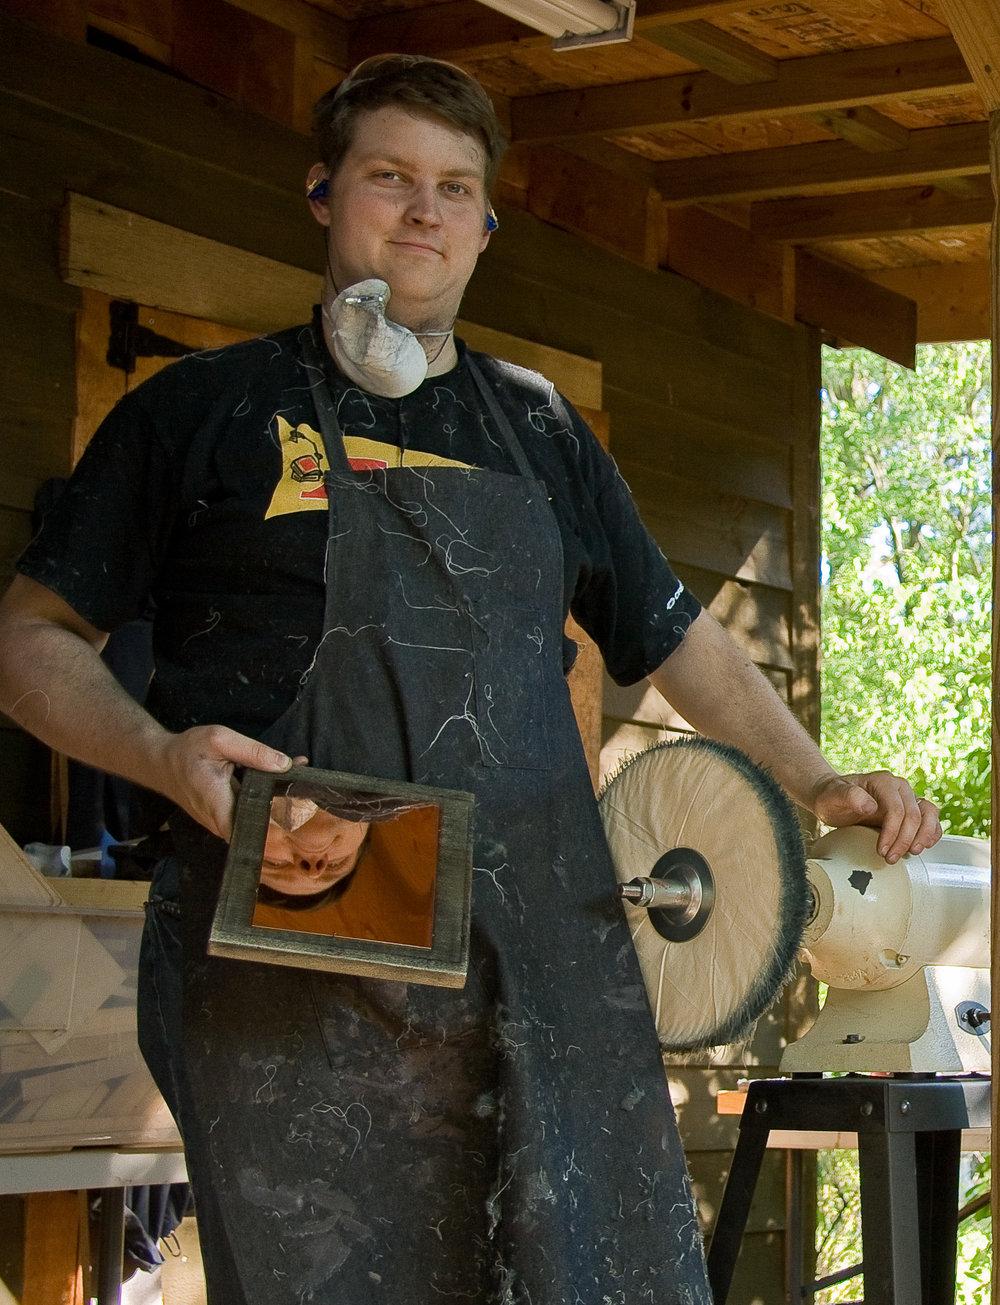 Making Daguerreotype Plates, 2008